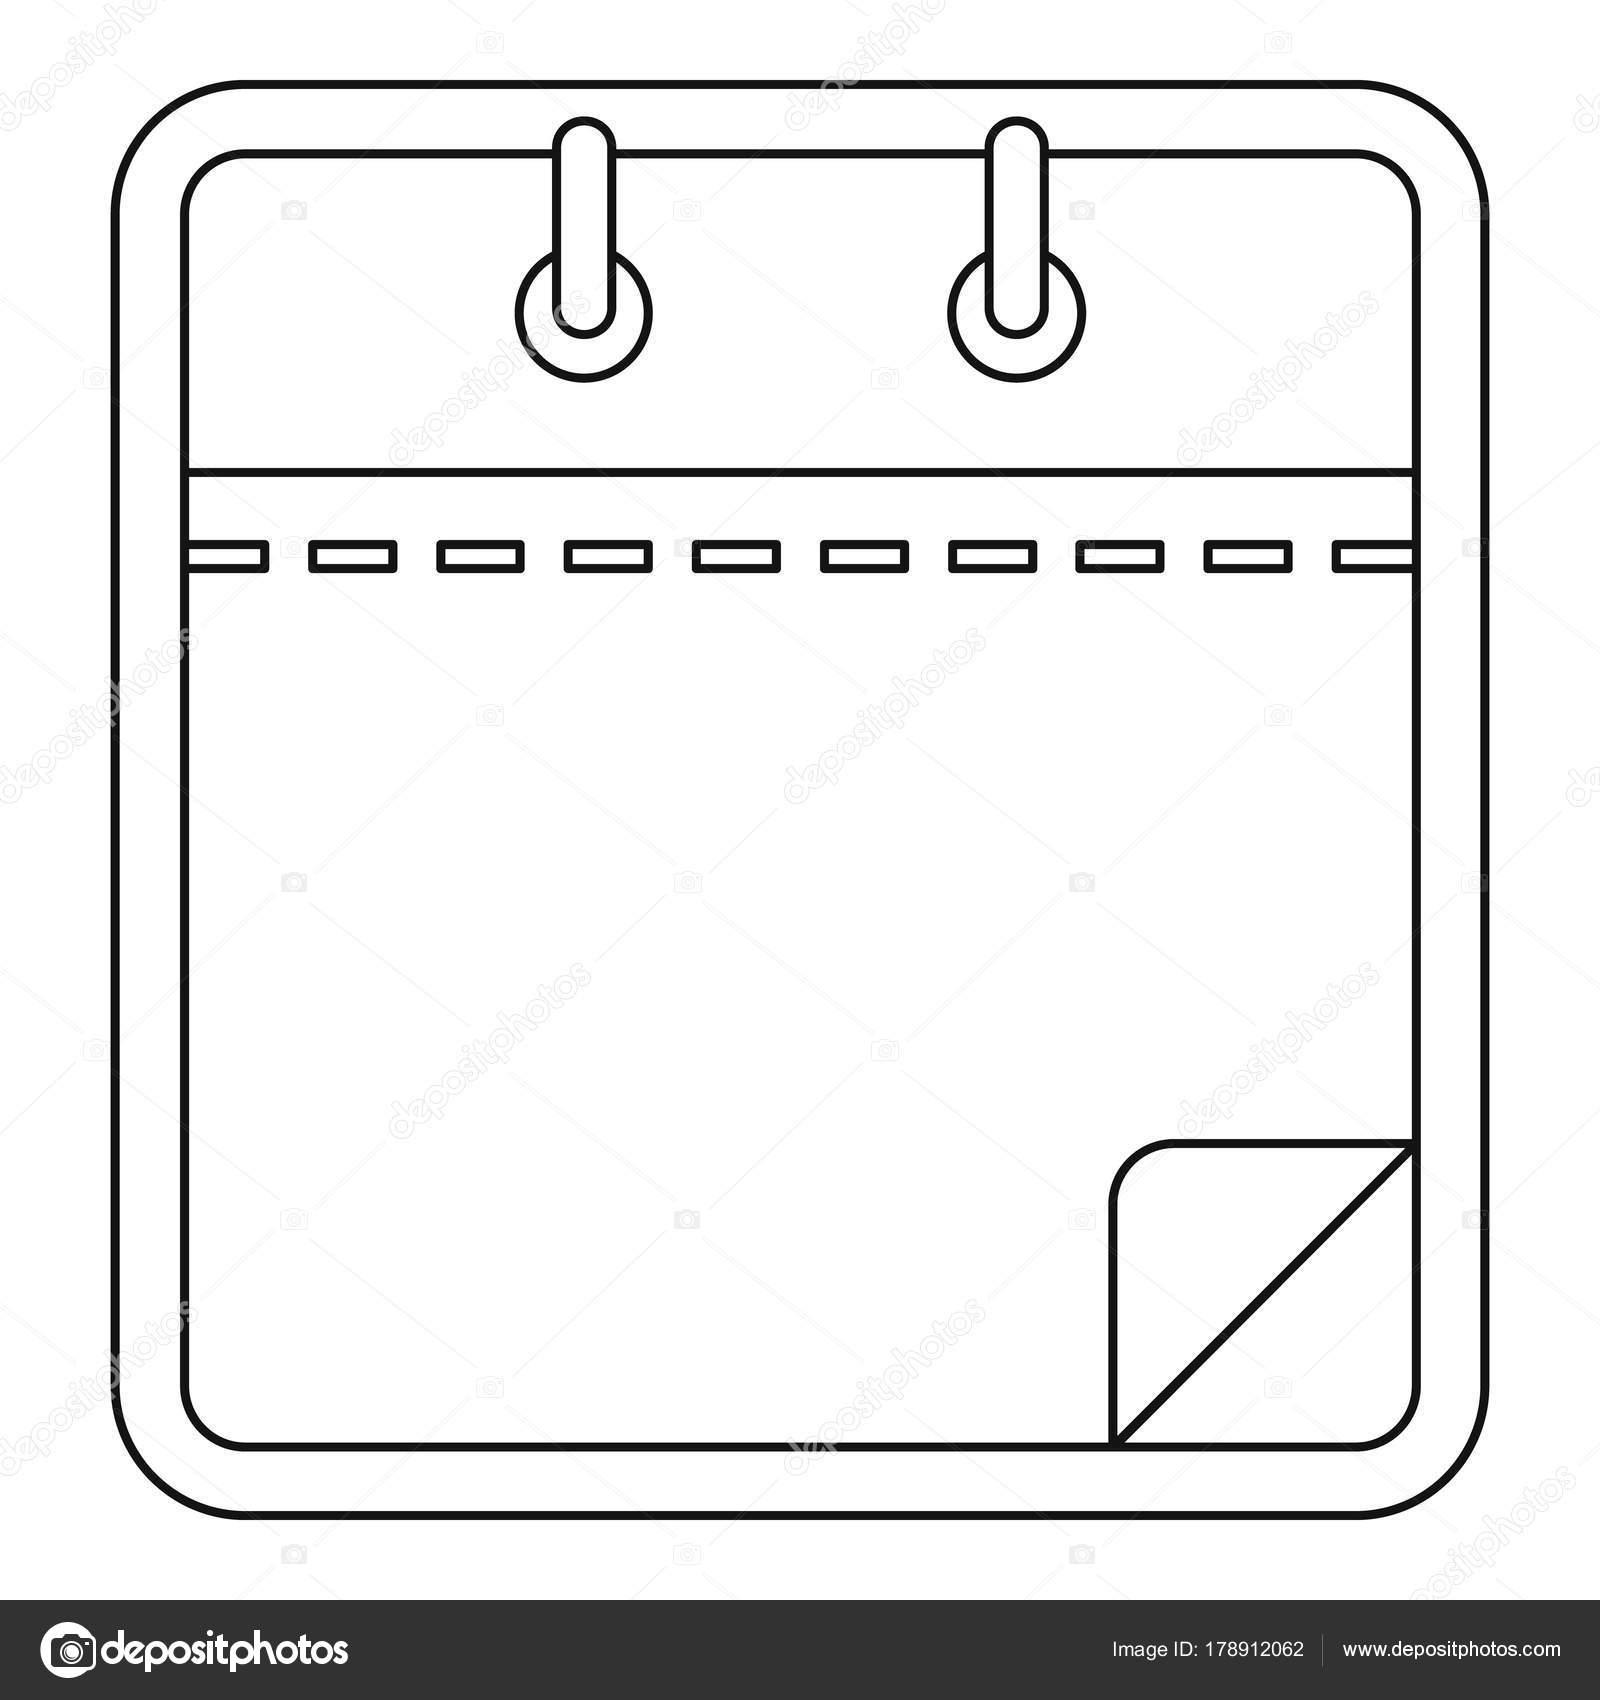 Blank Calendar Icon, Outline Style. — Stock Vector inside Blank Calendar Icon